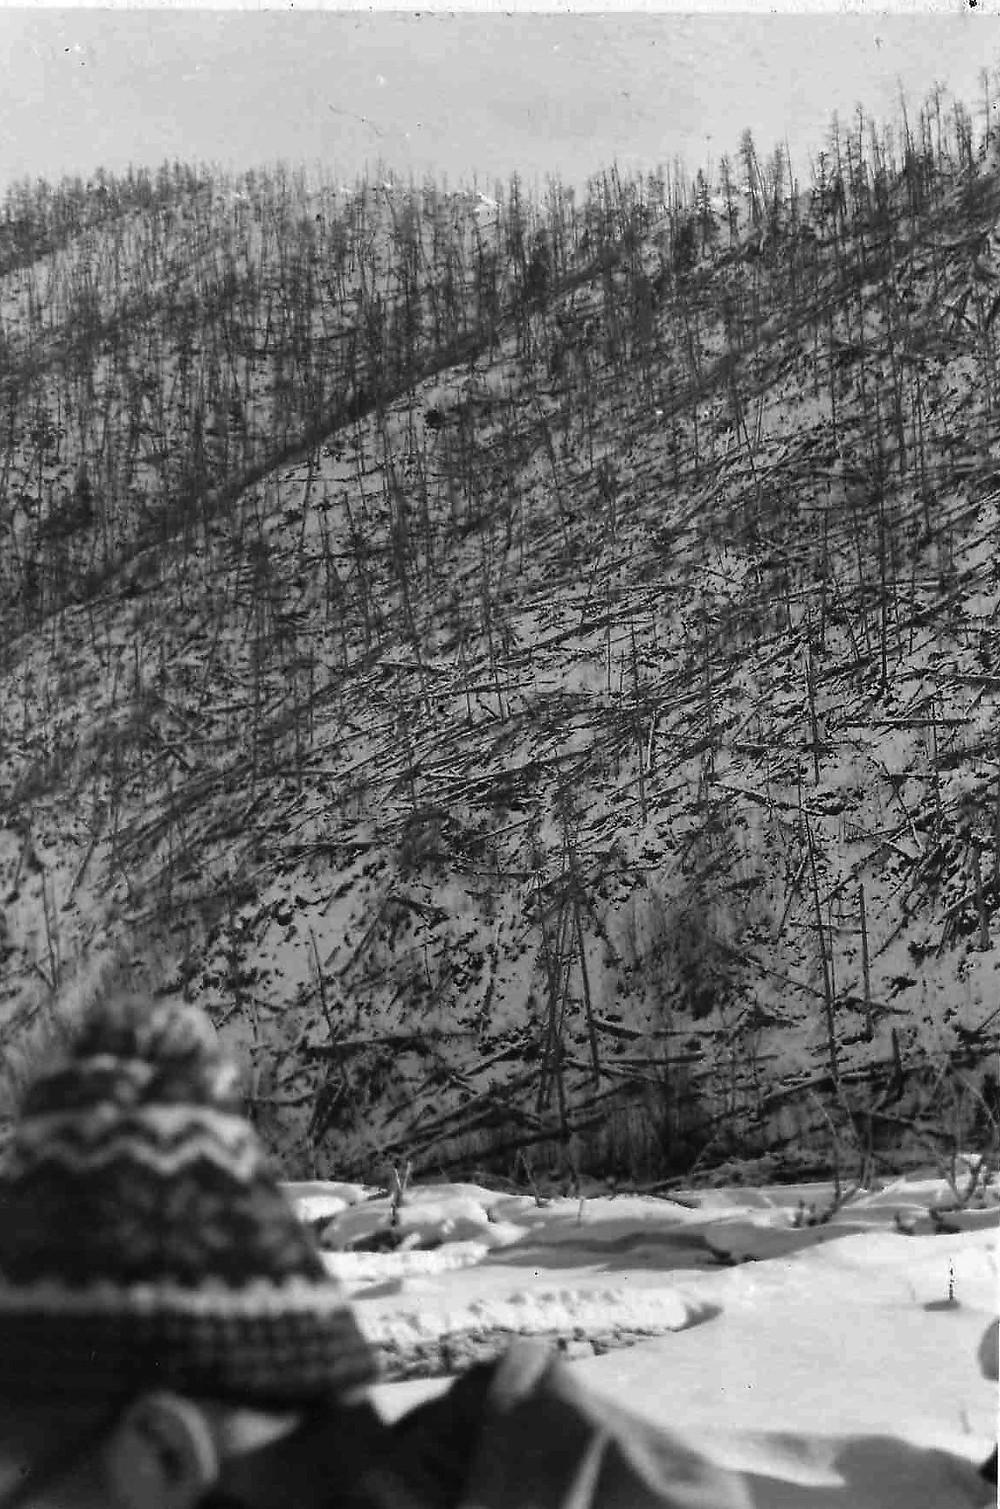 Поваленный лес  skitour.club  Блог Сергея Чеботова